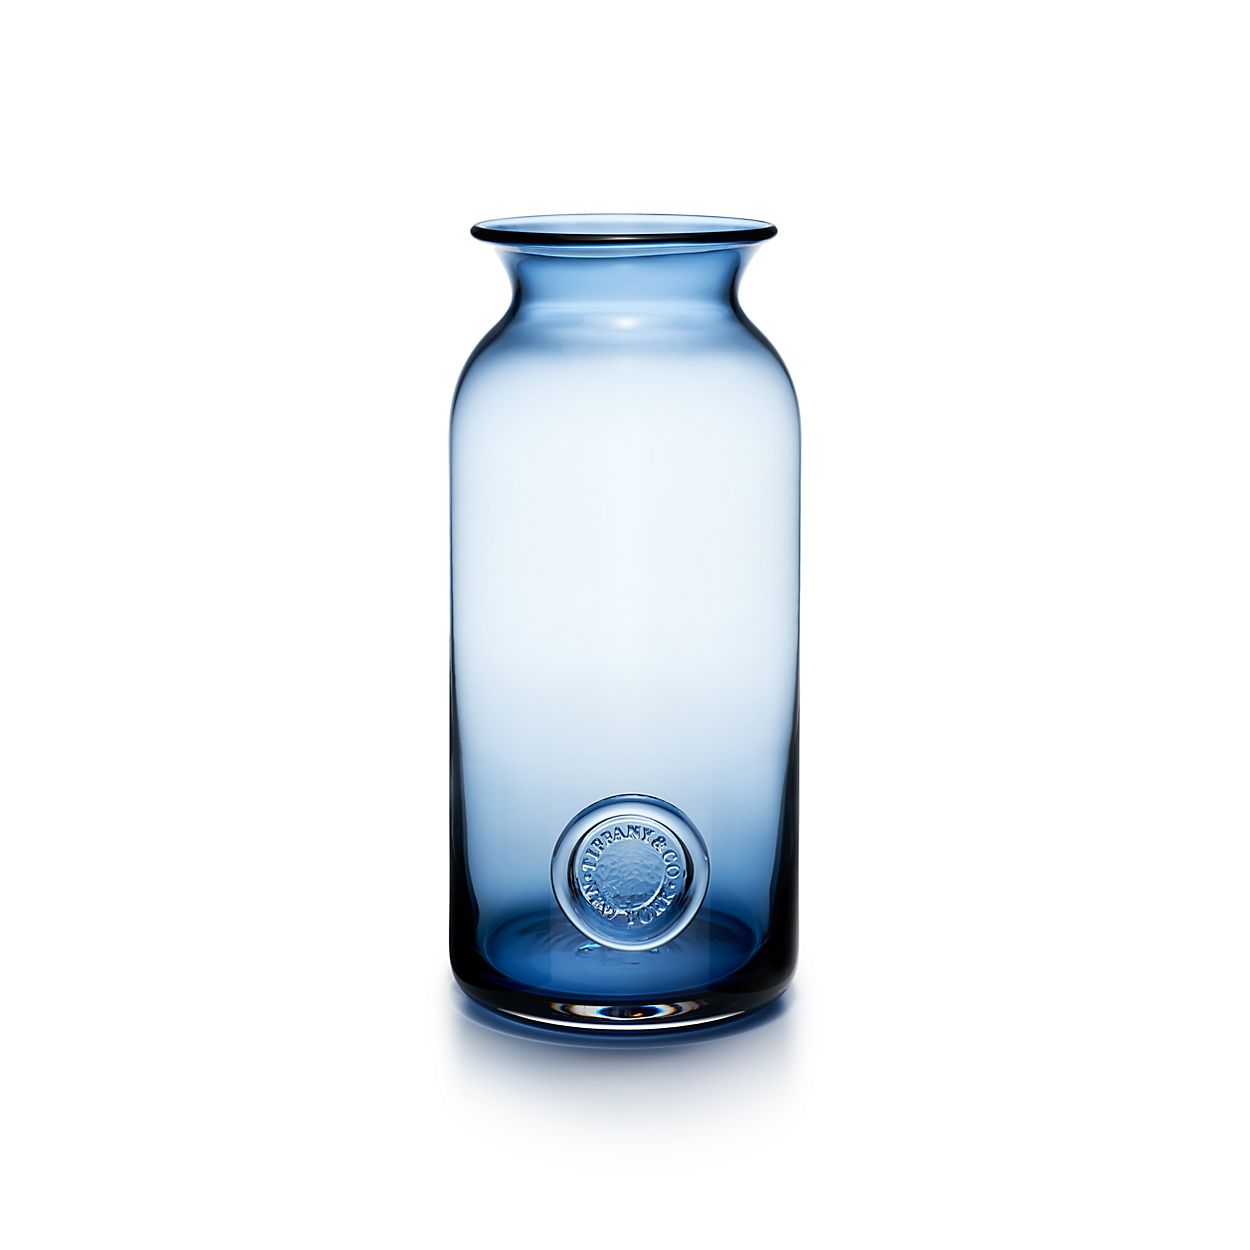 Tiffany seal vase in ink blue lead crystal small tiffany co tiffany sealvase tiffany sealvase reviewsmspy